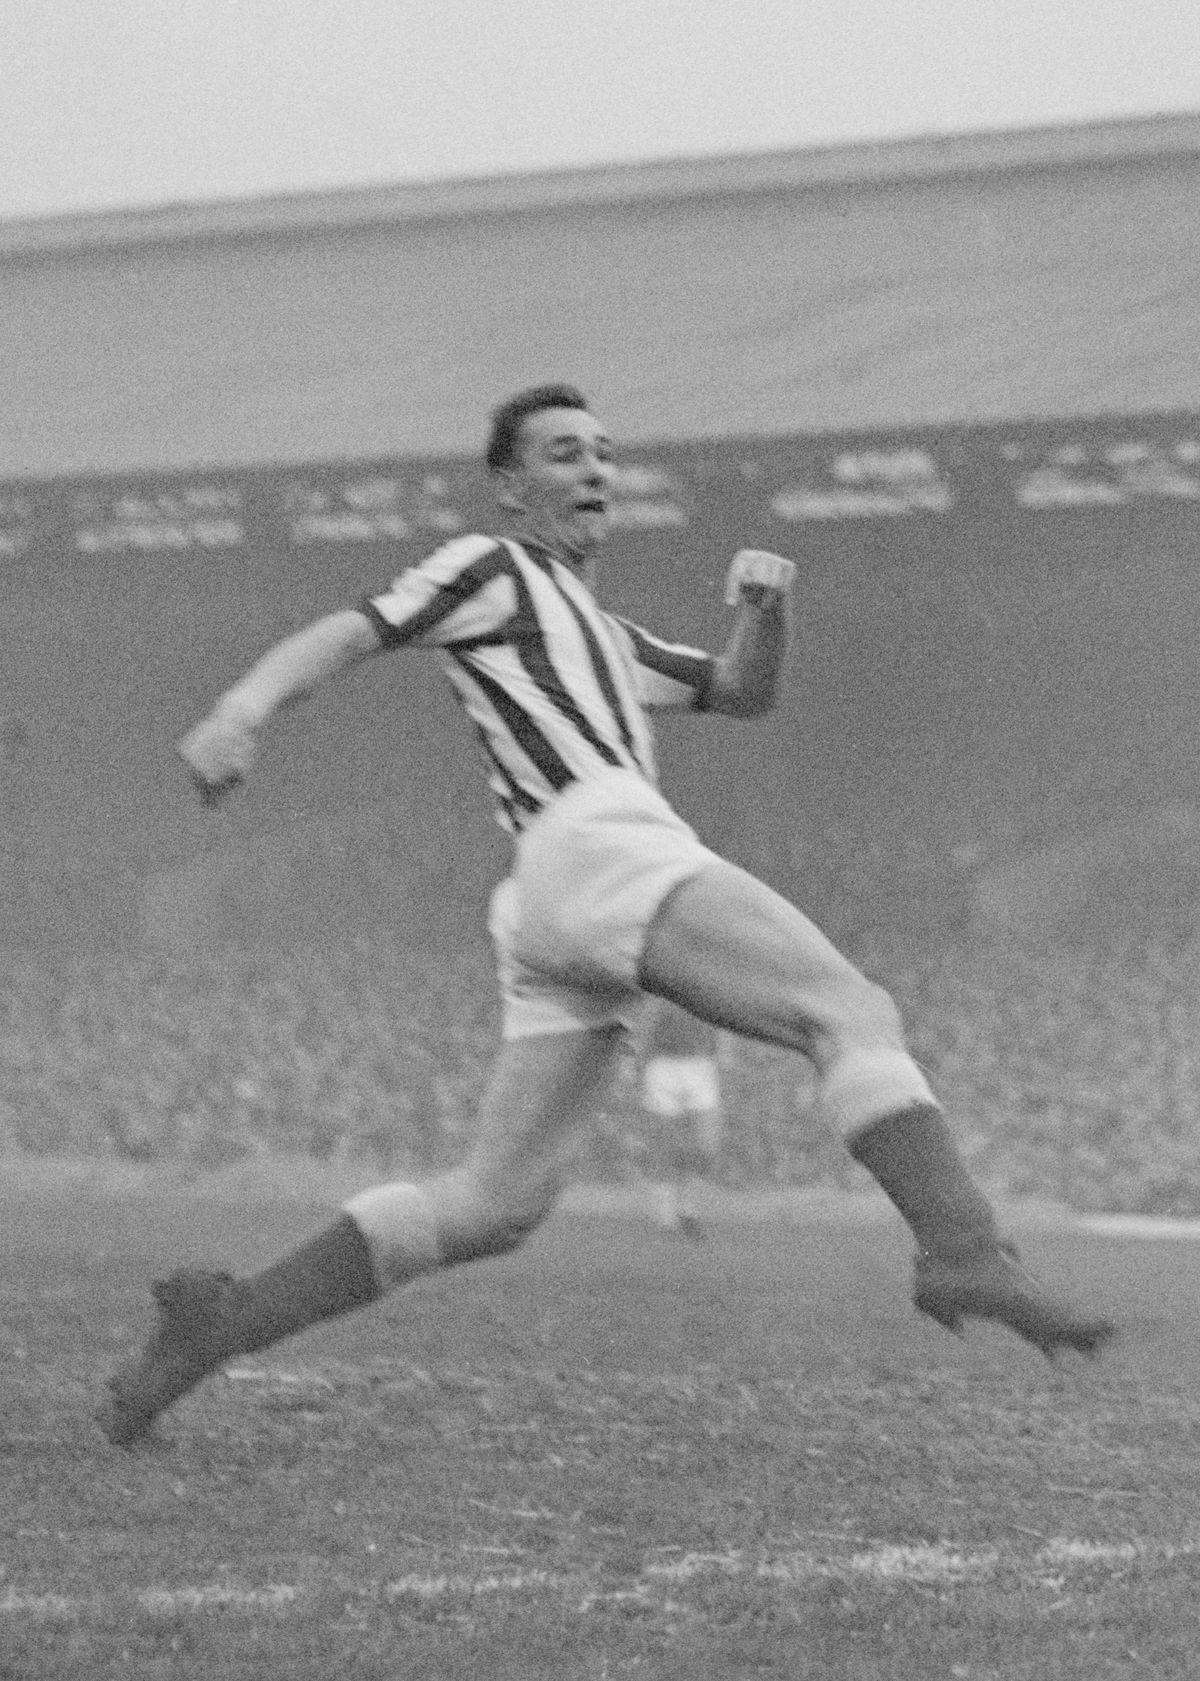 Sunderland v Cardiff 1962/63. Sunderland's Brian Clough in action against Cardiff at Roker Park. Sunderland won the matc